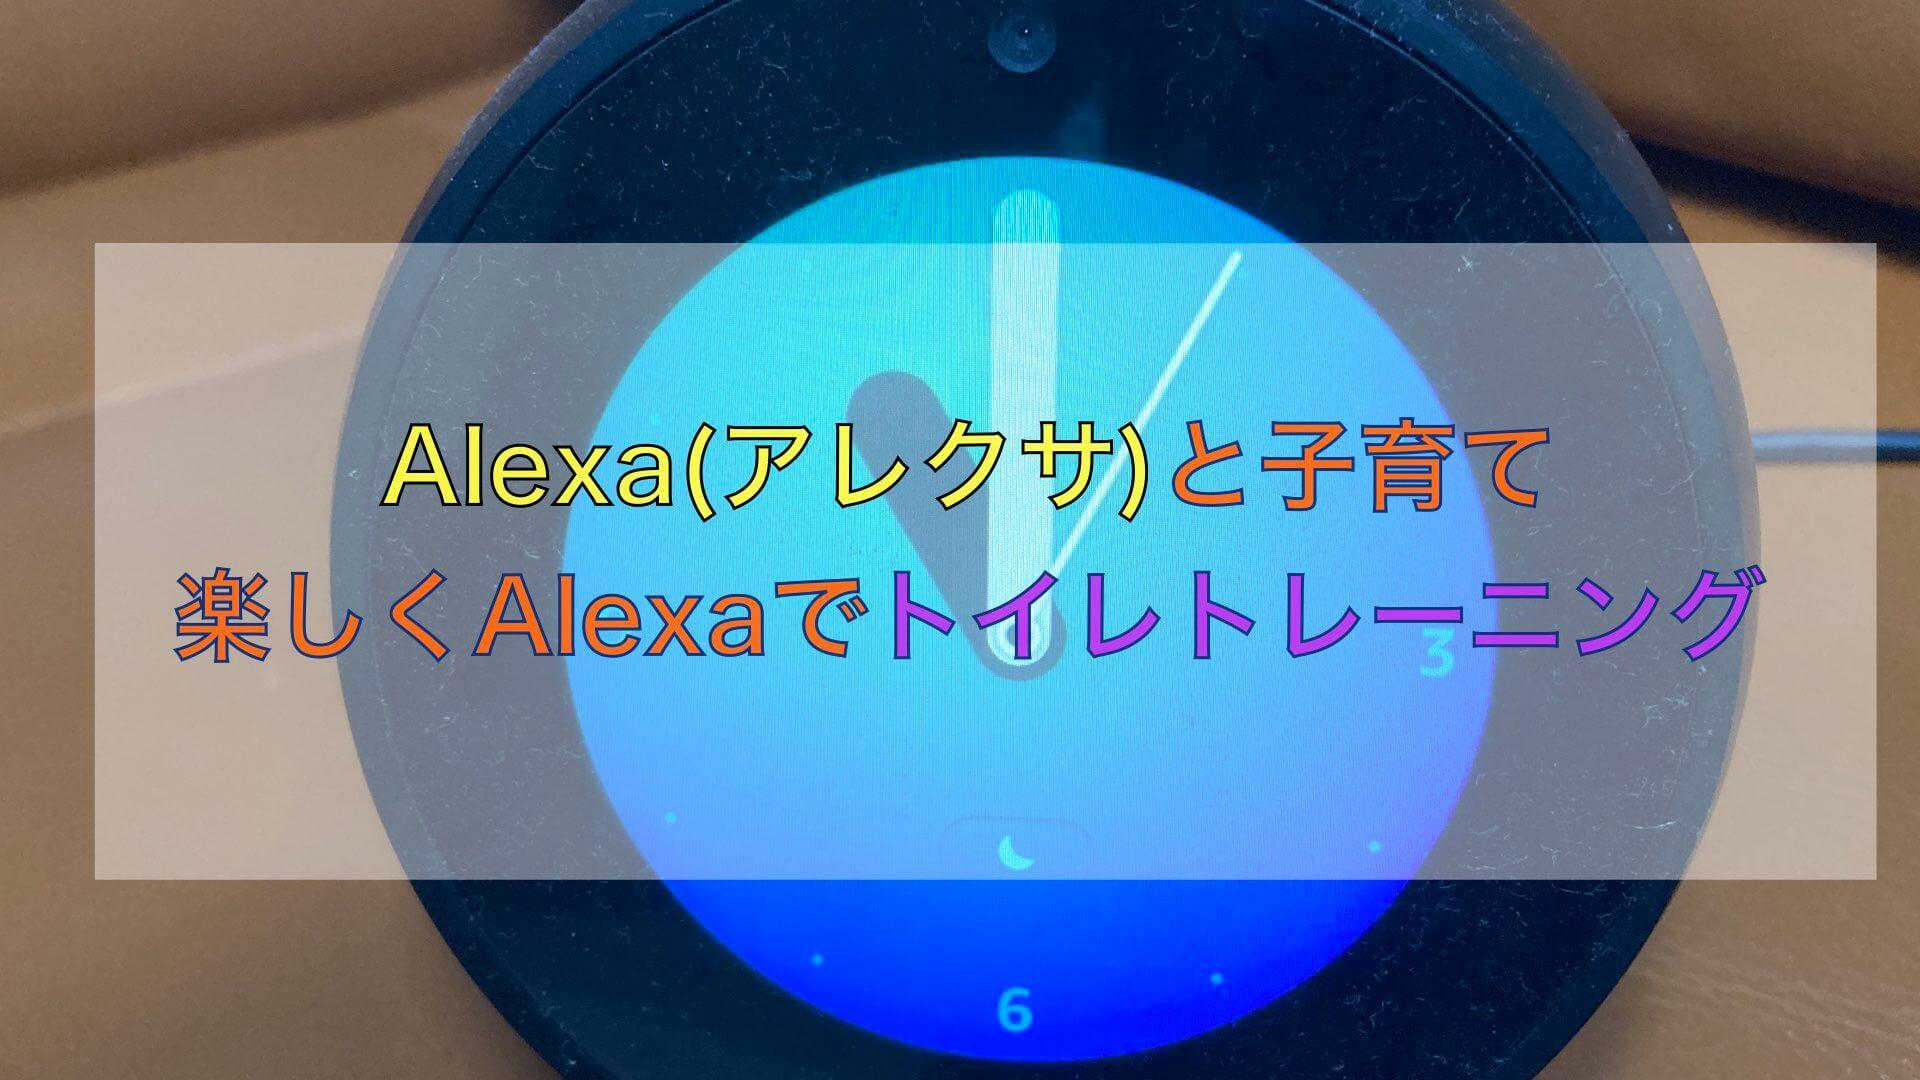 Alexa(アレクサ)と子育て|楽しくトイレトレーニングする方法